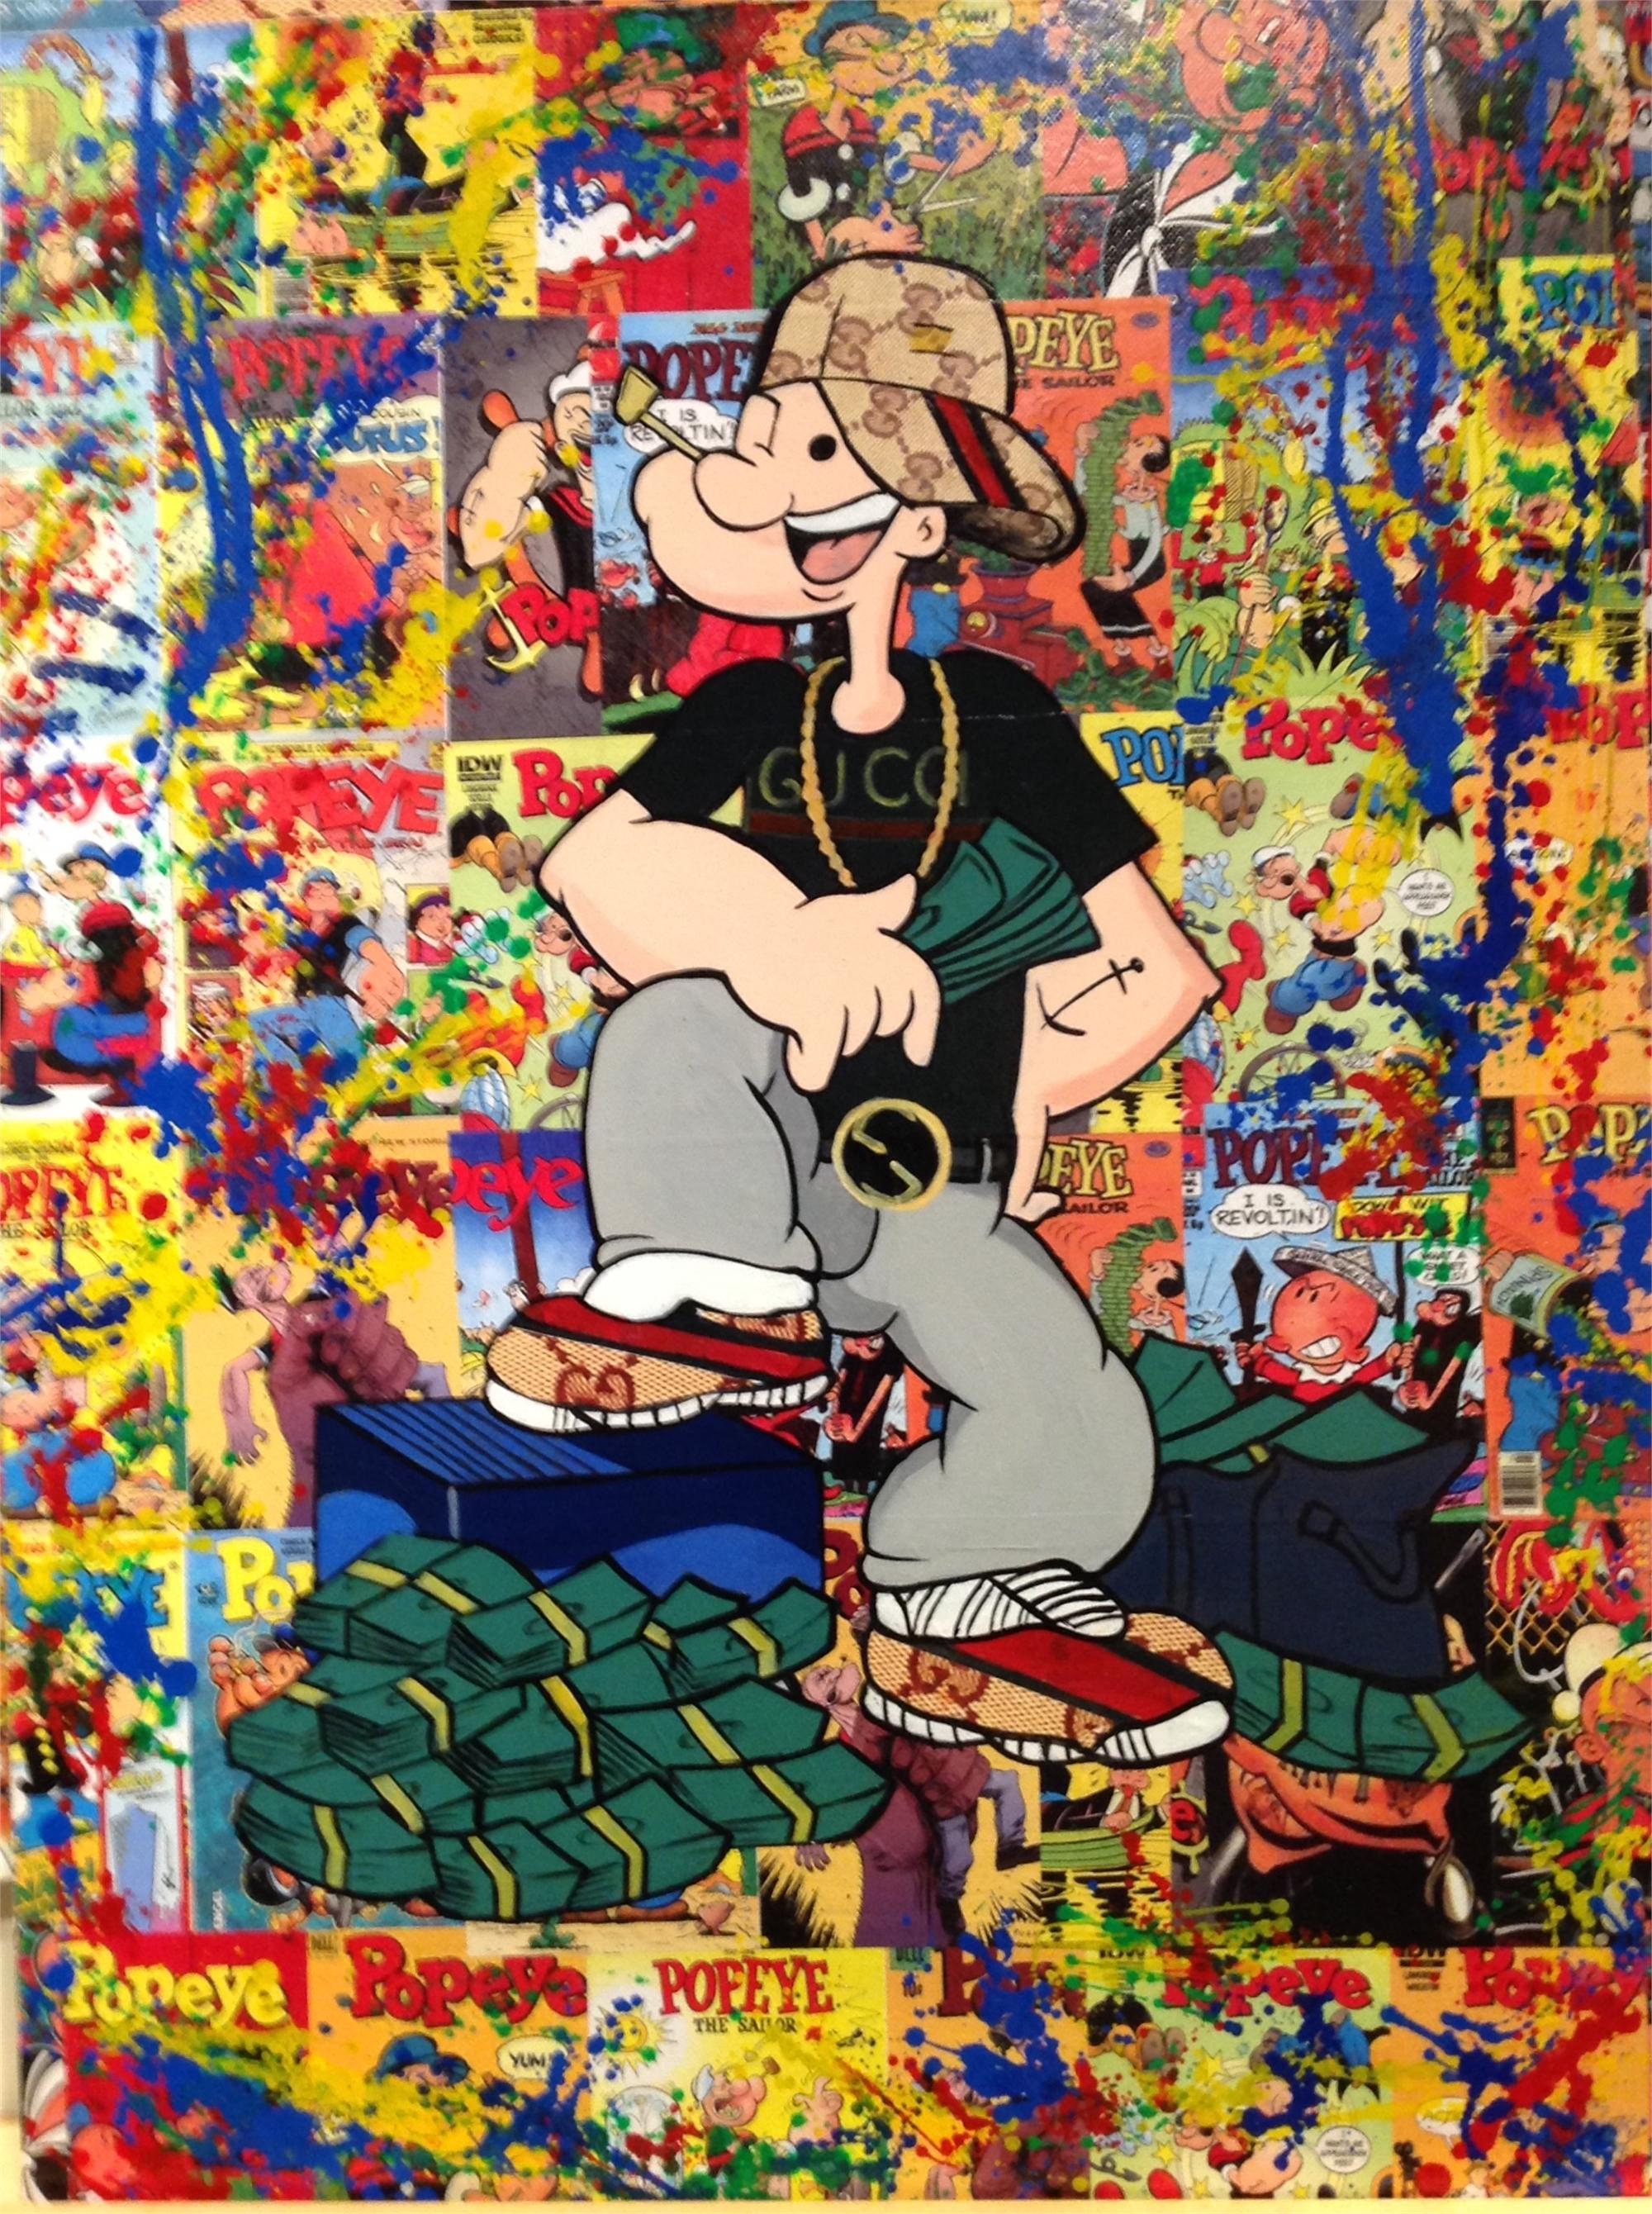 """Gucci Popeye The Salior Man"" by Buma Project"